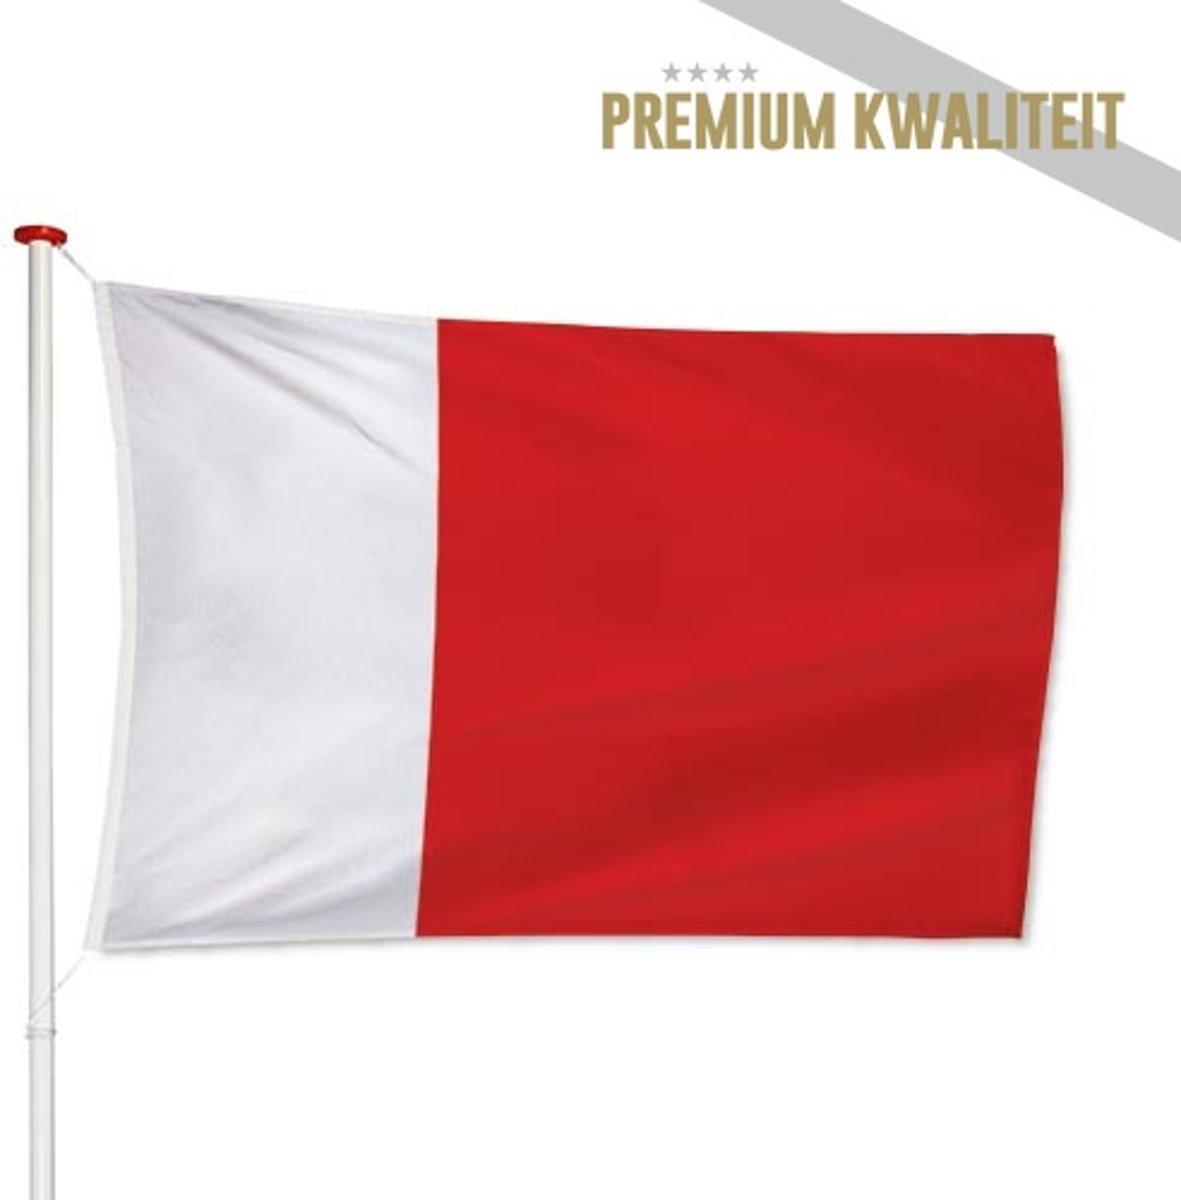 Dubaise Vlag Dubai 150x225cm kopen